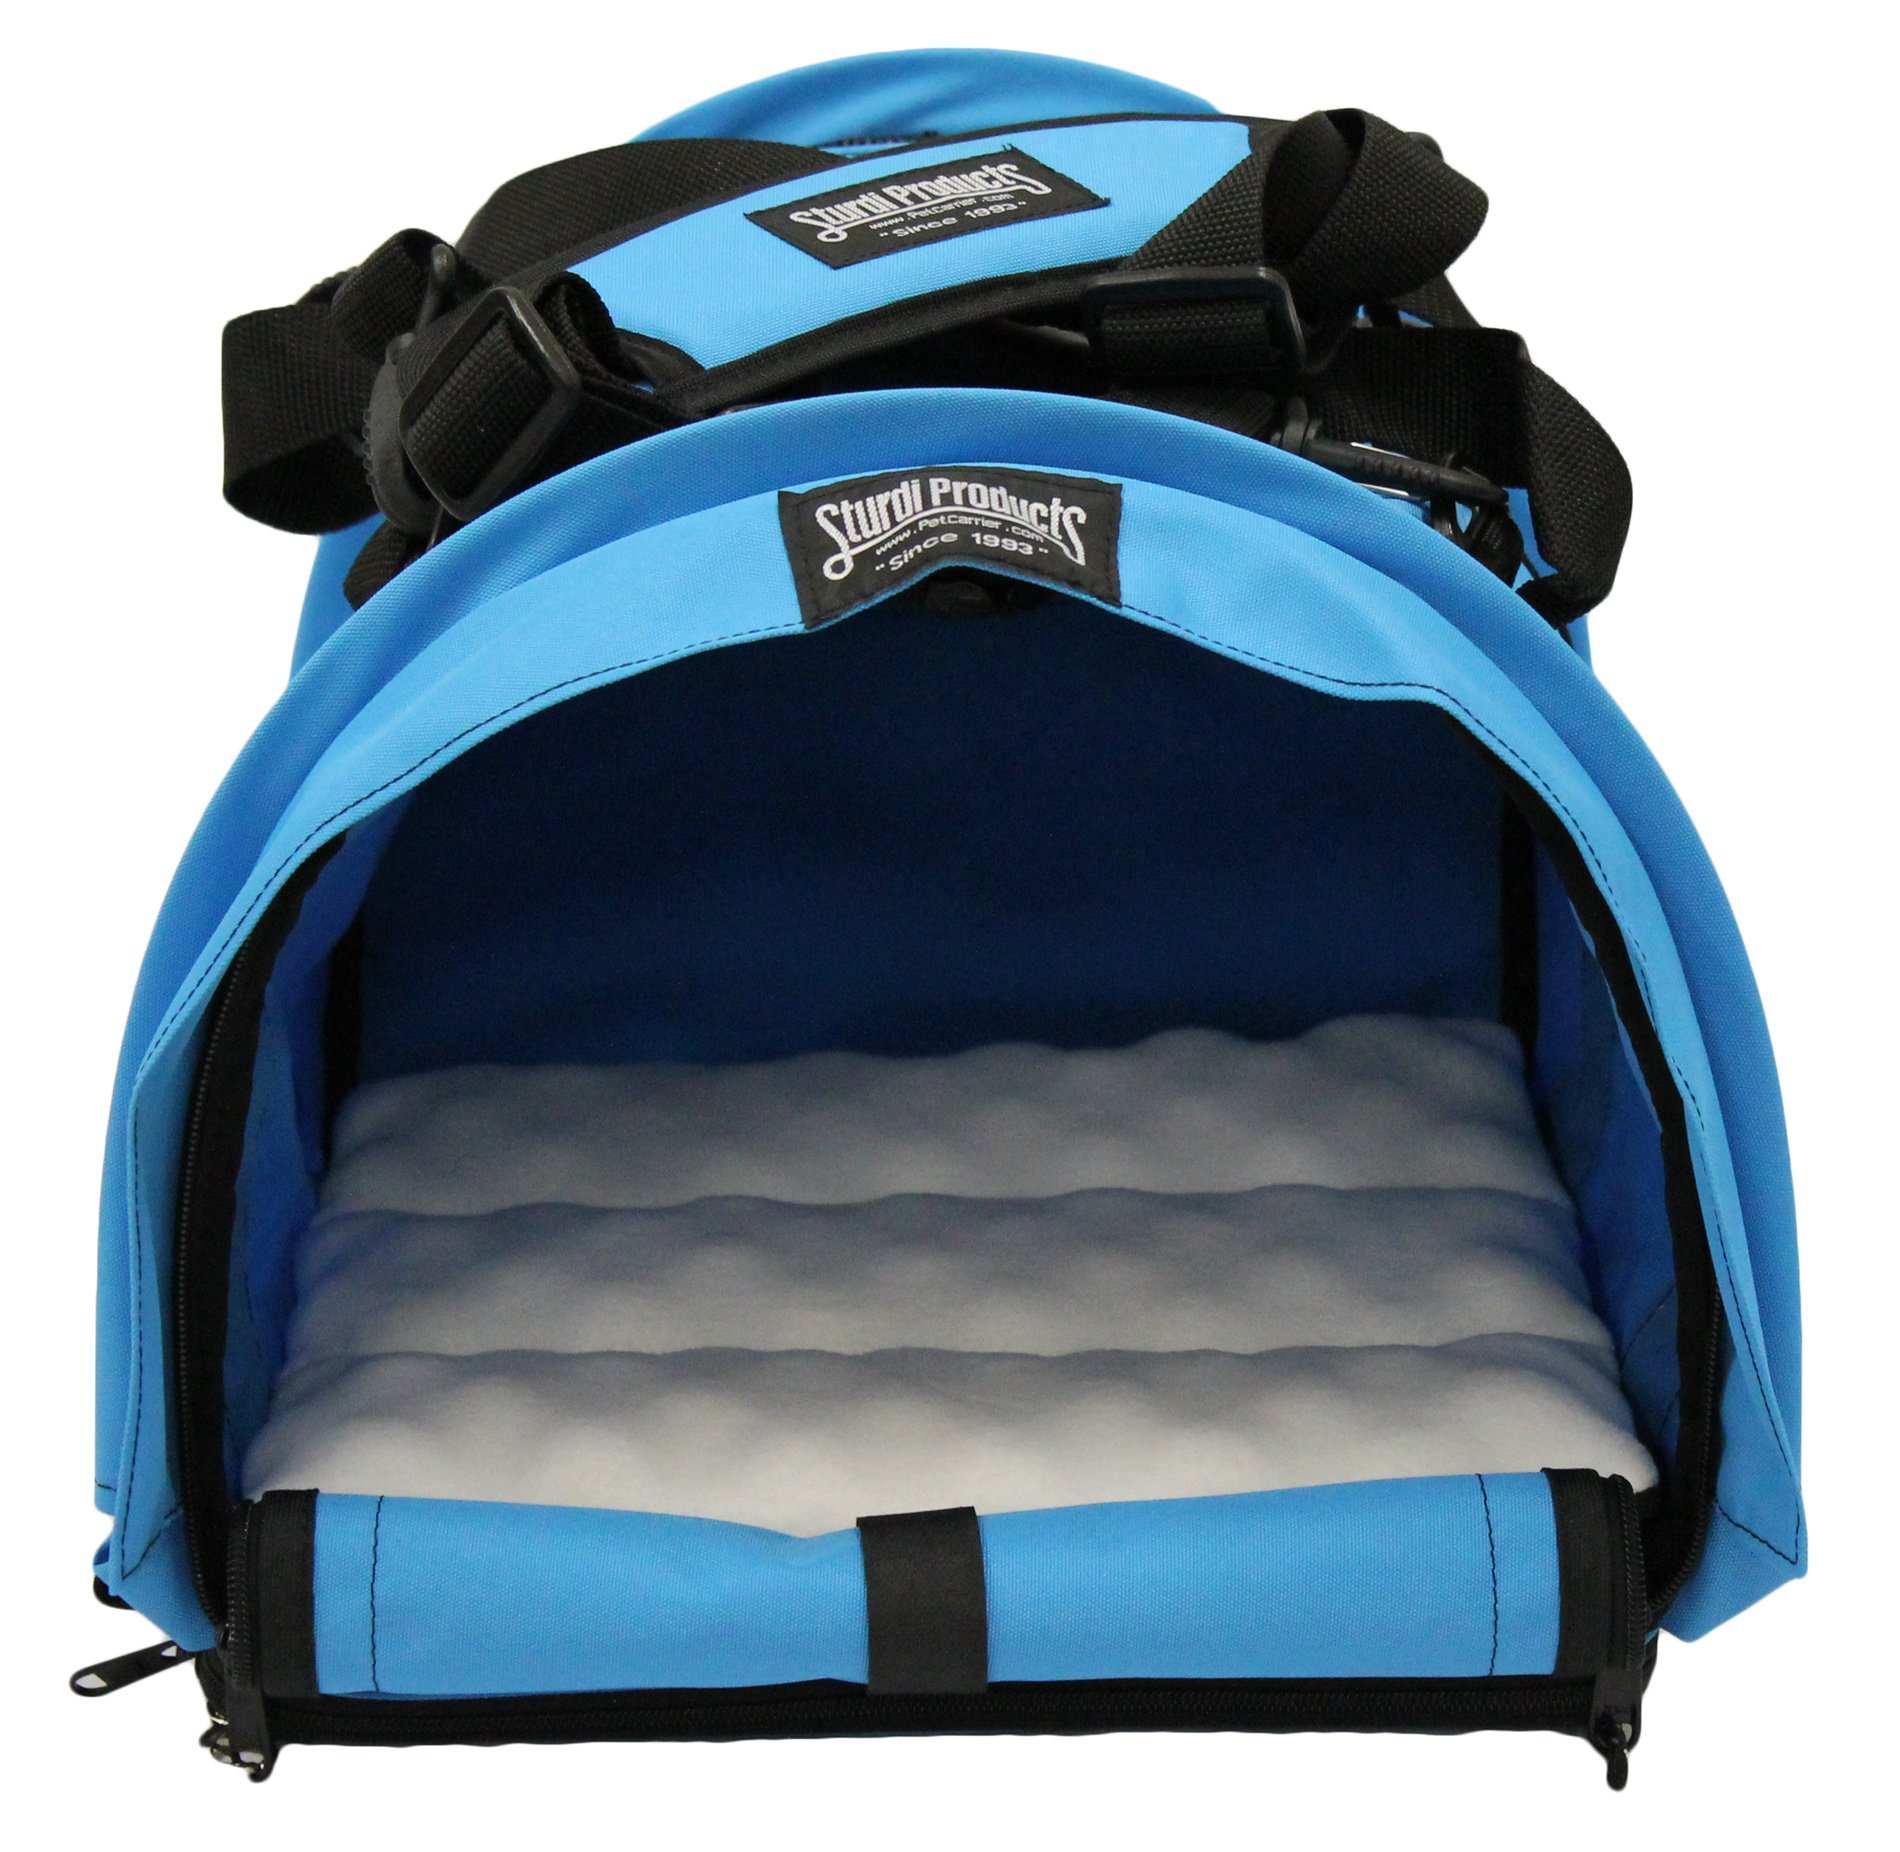 Sturdi Products SturdiBag Cube Pet Carrier, Large, Blue Jay